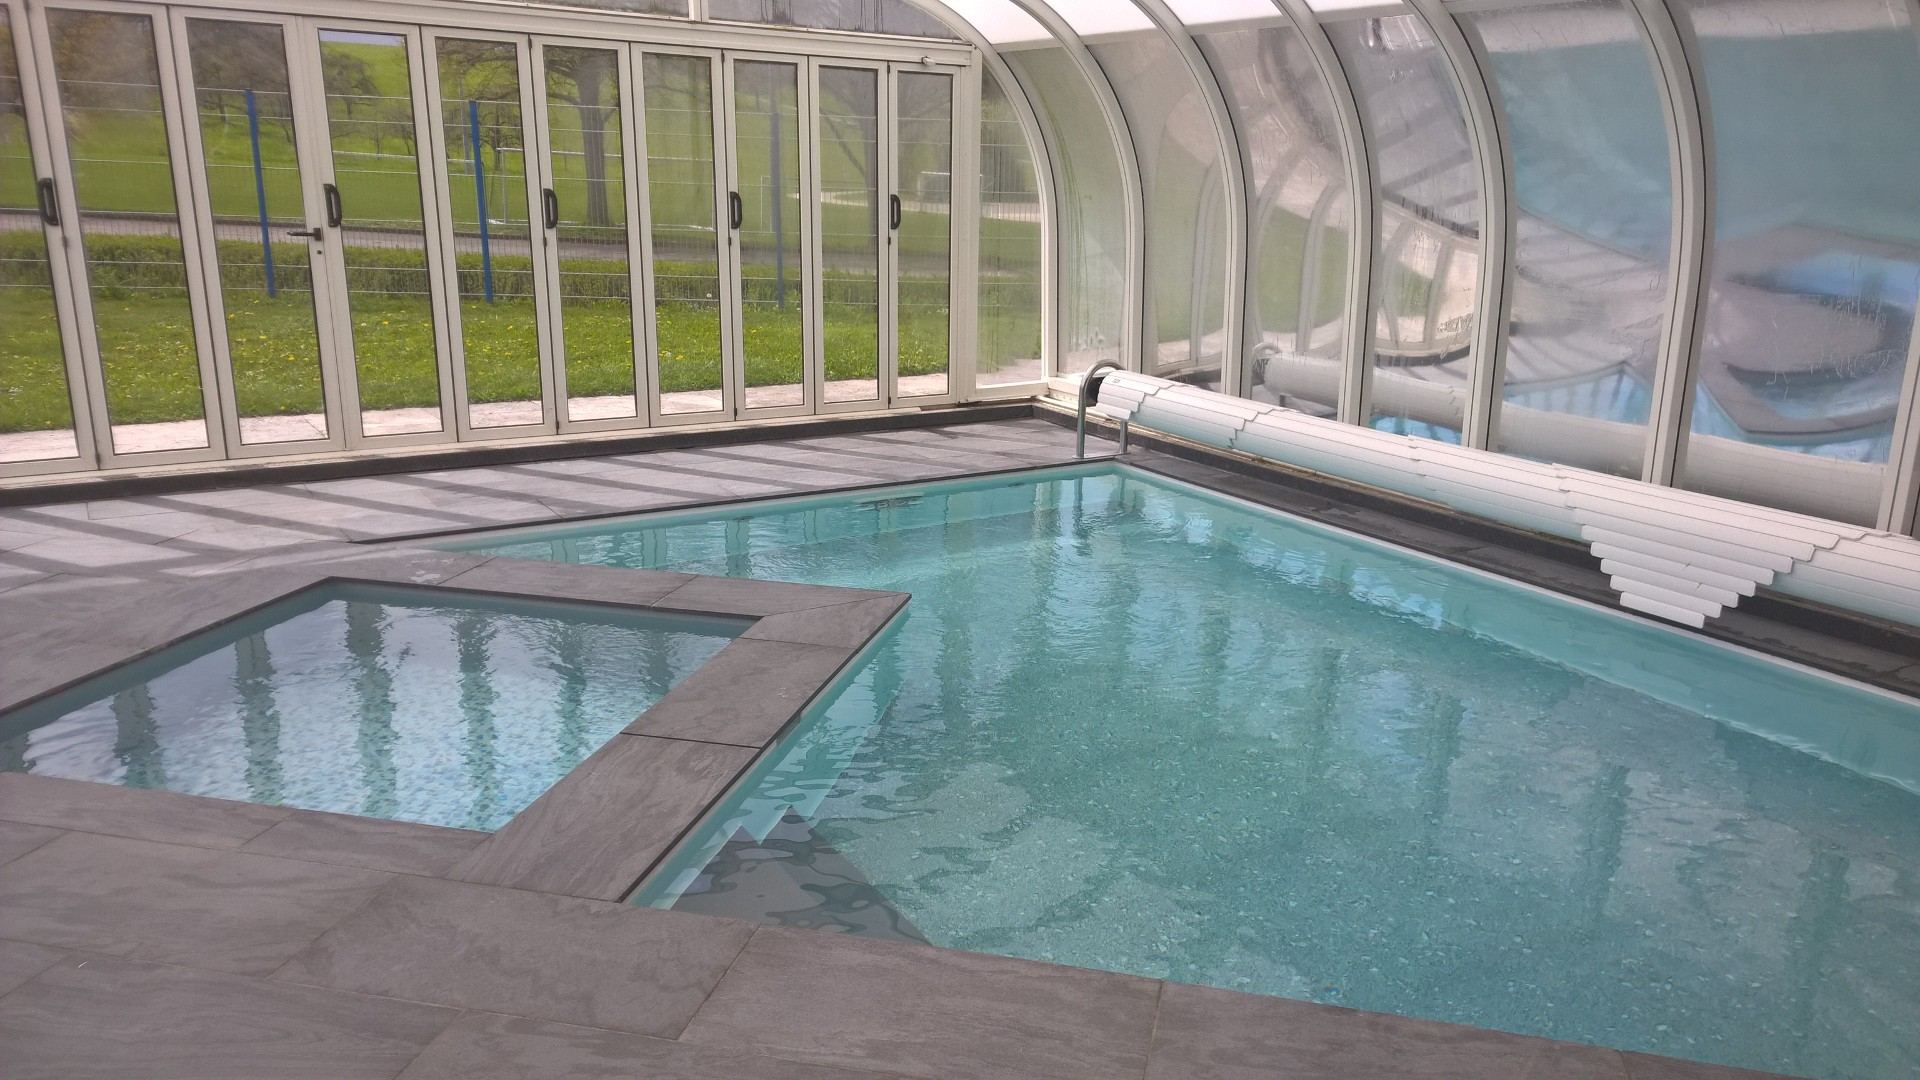 agence technicit piscines formation pose membrane pvc. Black Bedroom Furniture Sets. Home Design Ideas